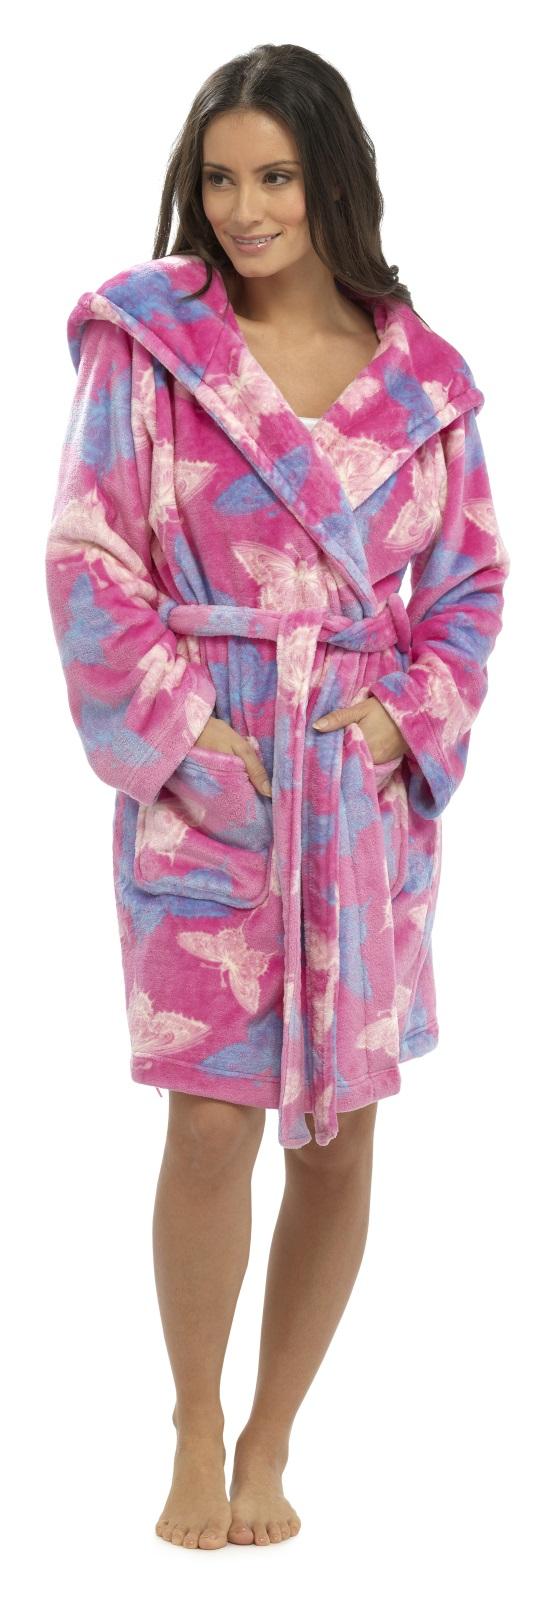 Womens Hooded Dressing Gown Knee Length Bath Robe Housecoat + Belt ...